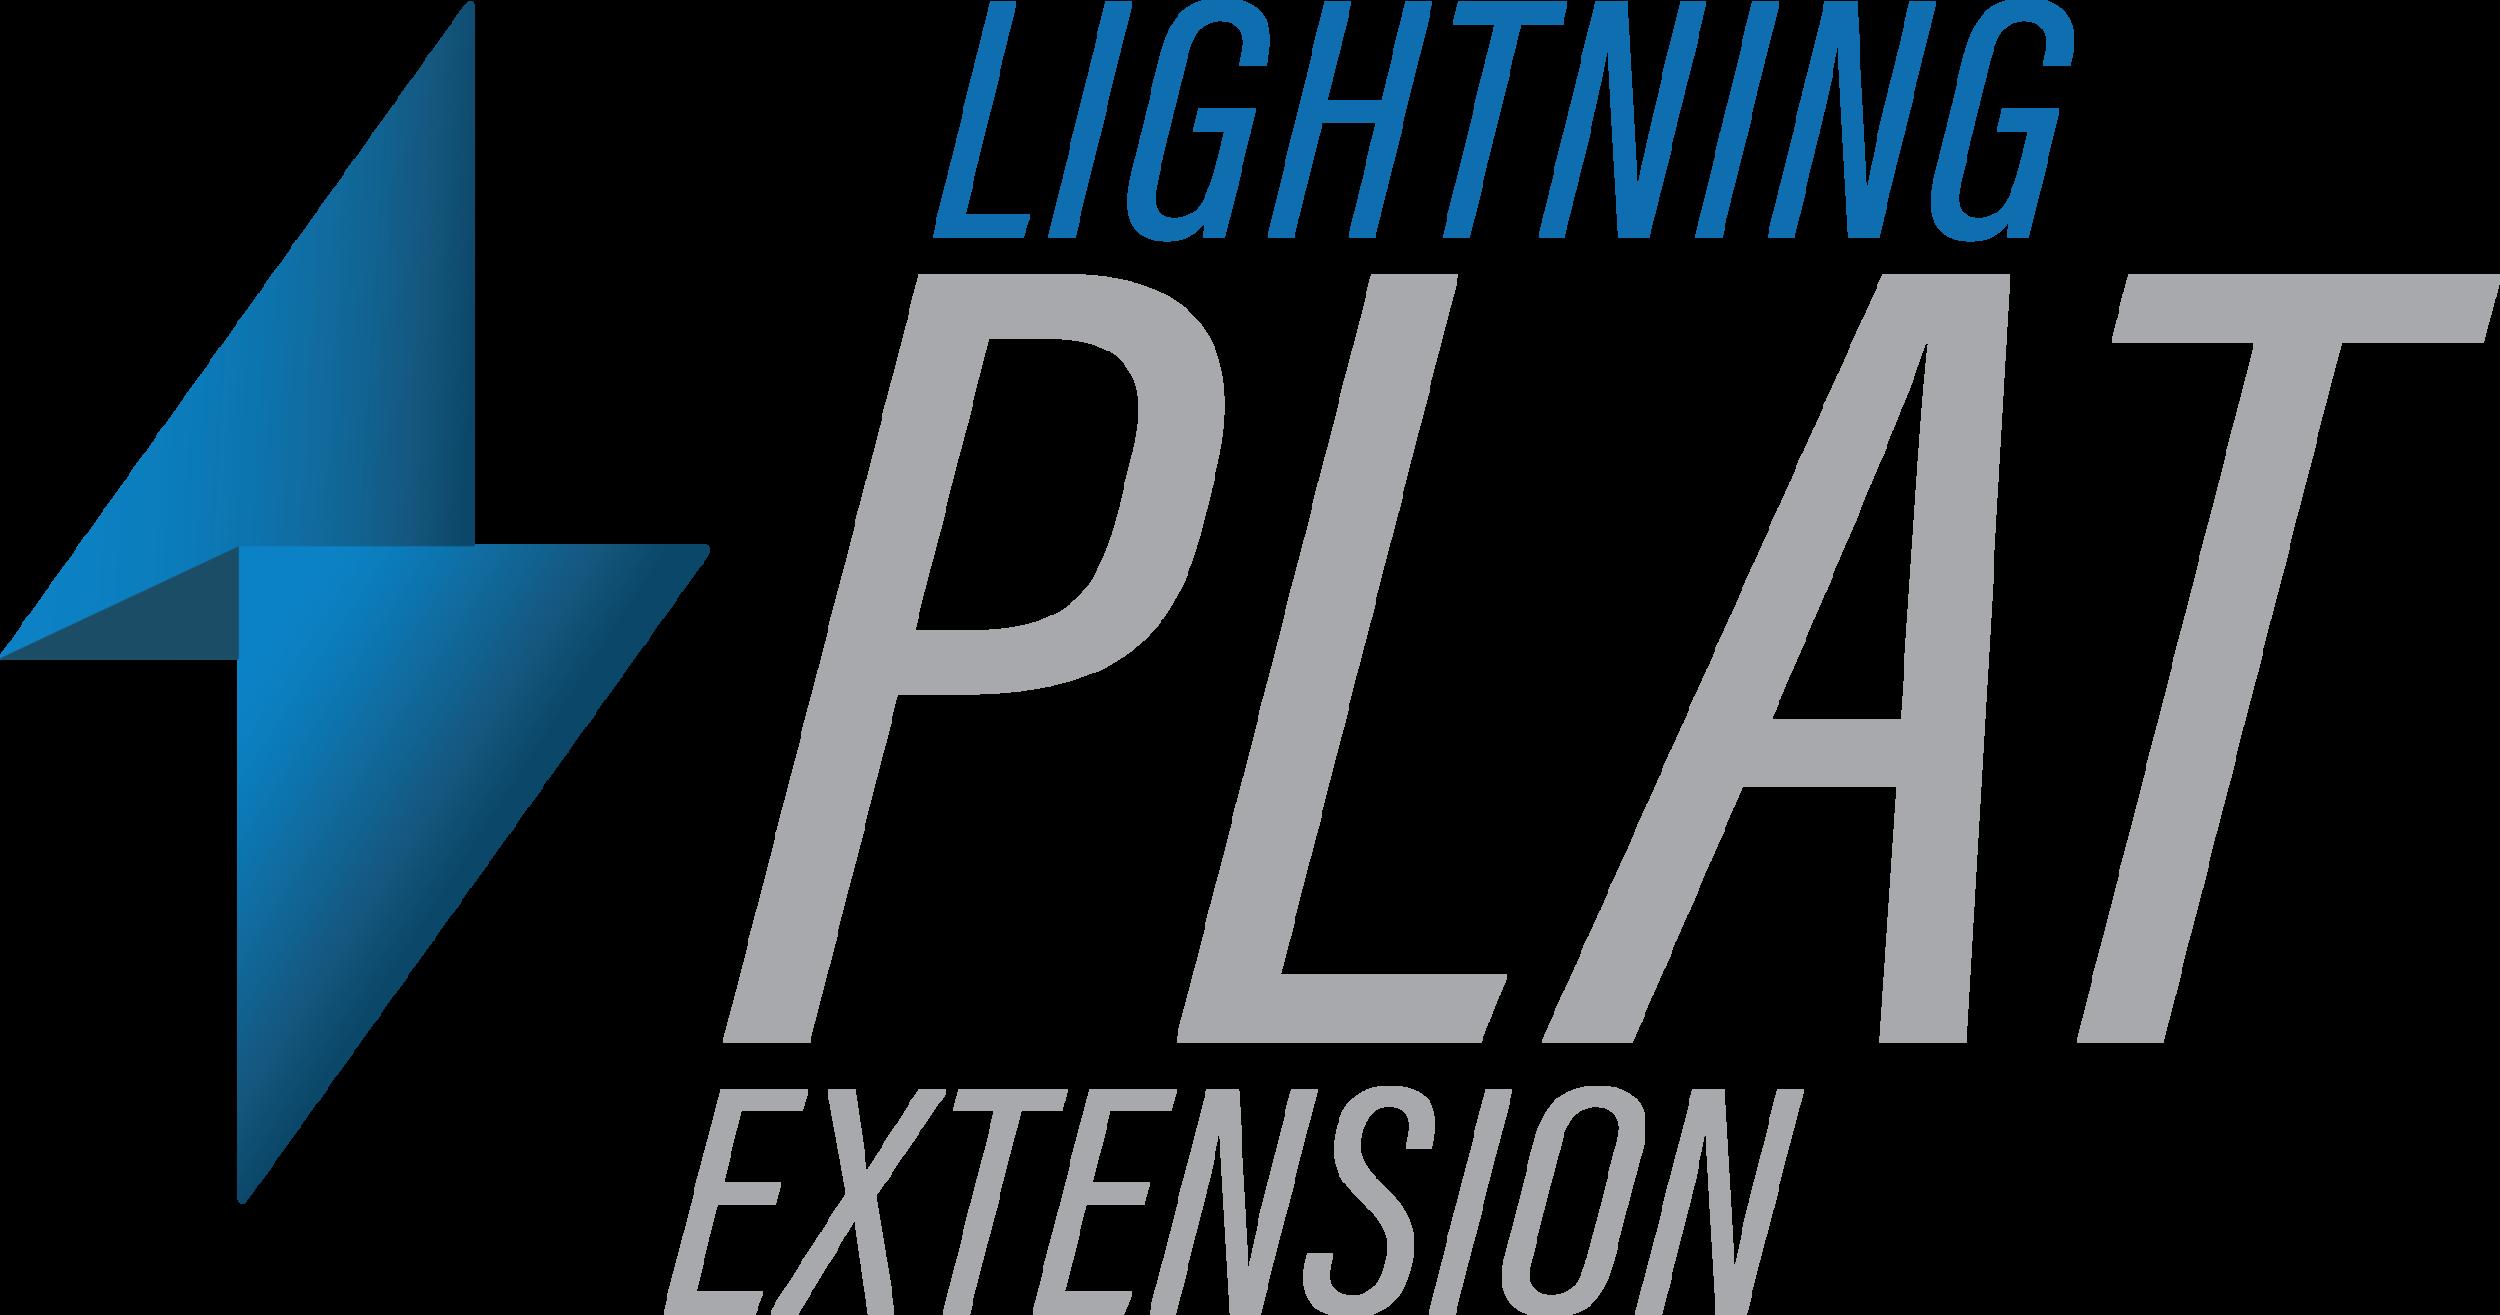 lightning plat sheet gen automation pipeline arcgis